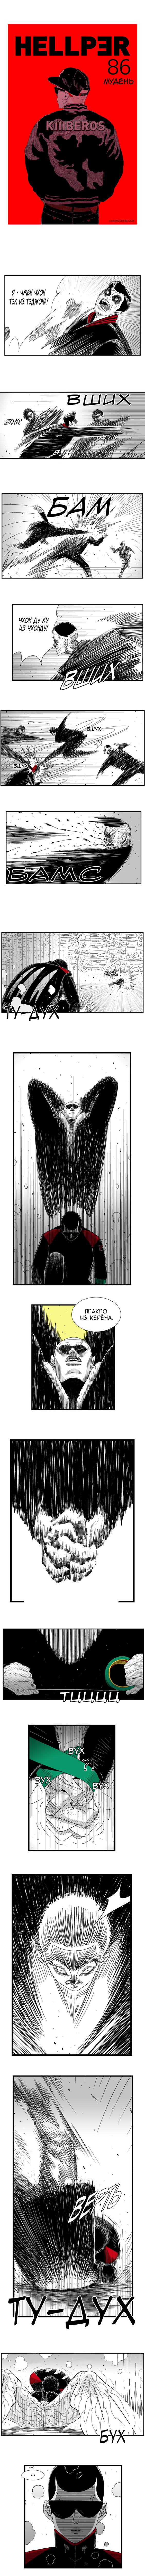 https://r1.ninemanga.com/comics/pic2/61/23549/389117/151359020899.jpg Page 1